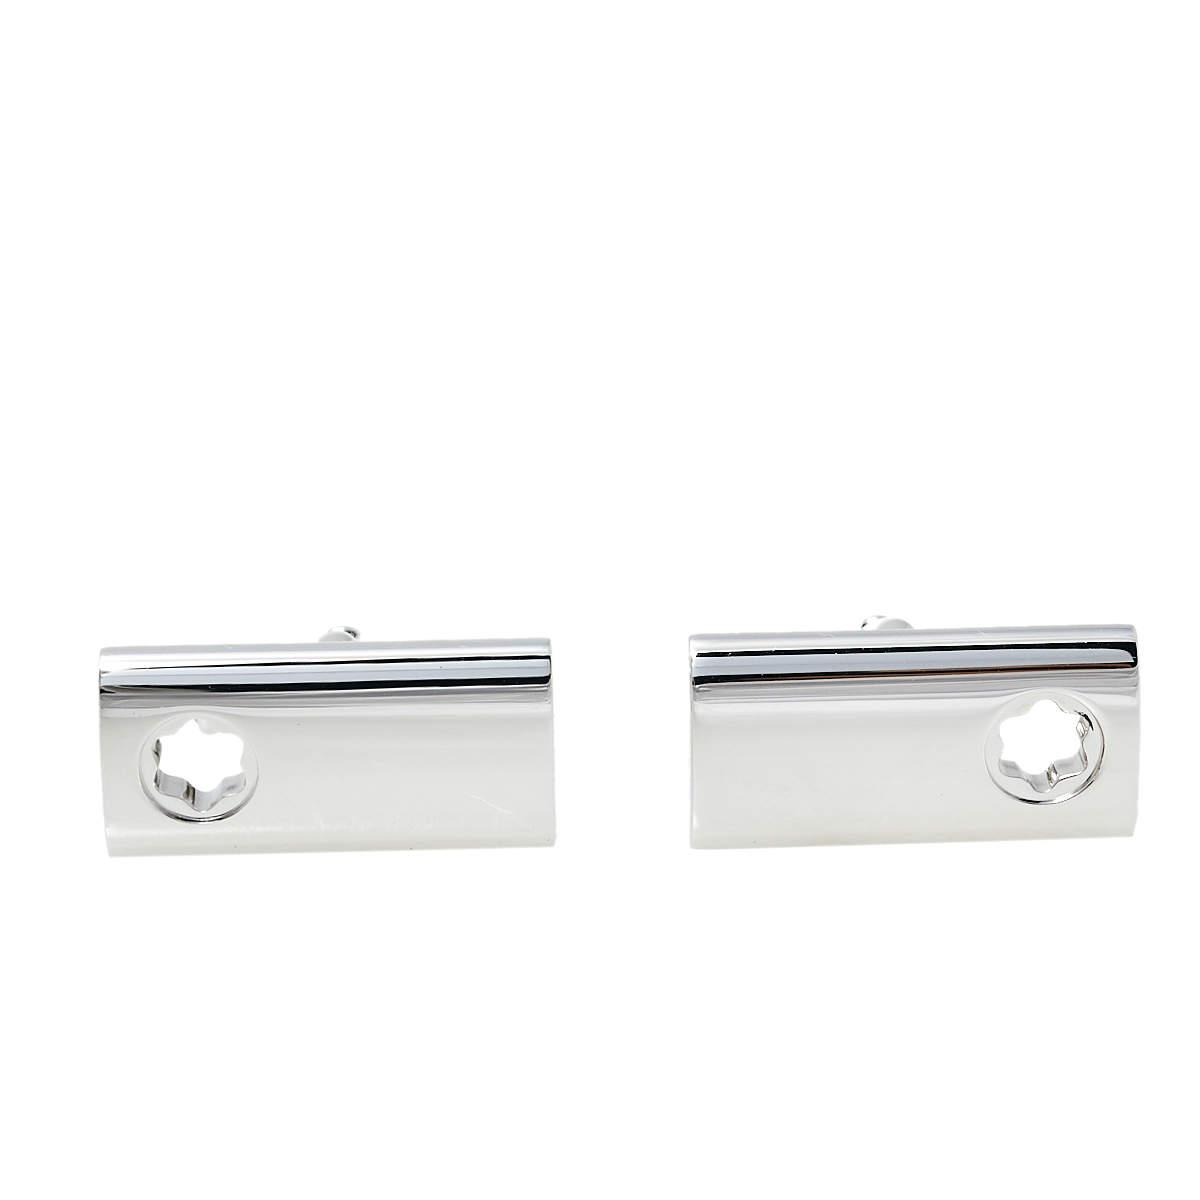 Montblanc Contemporary Sterling Silver Rectangular Star Cut Cufflinks